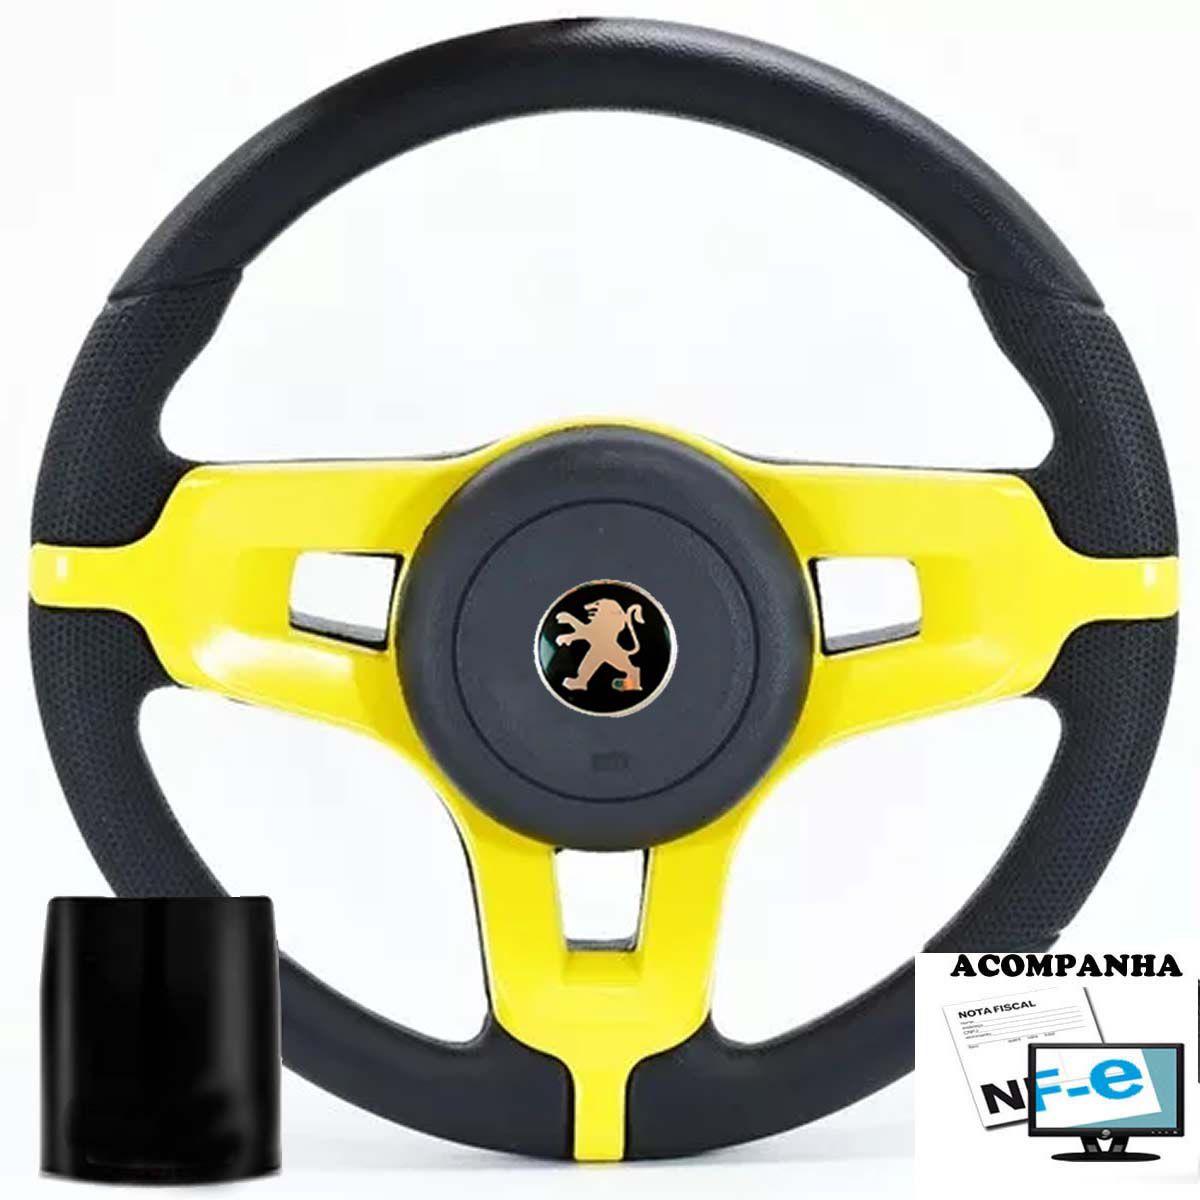 Volante Esportivo Mustang Peugeot 106 206 207 306 Sw Tampa Acionador de Buzina + Cubo